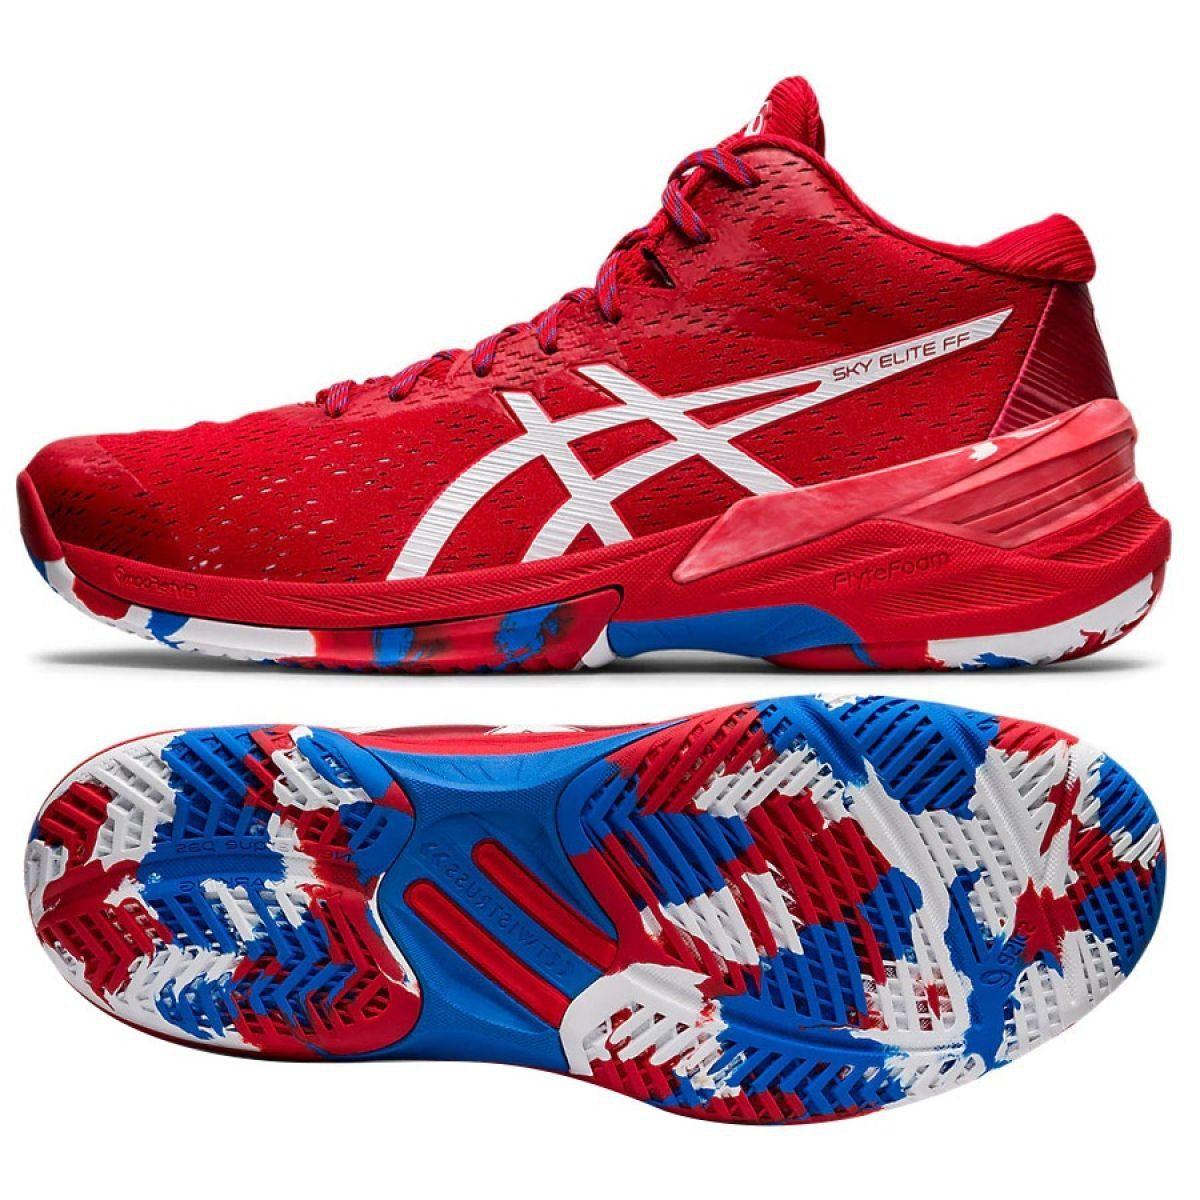 Buty Asics Sky Elite Ff Mt L E M 1051a040 600 Czerwone Czerwone Asics Asics Sneaker Shoes